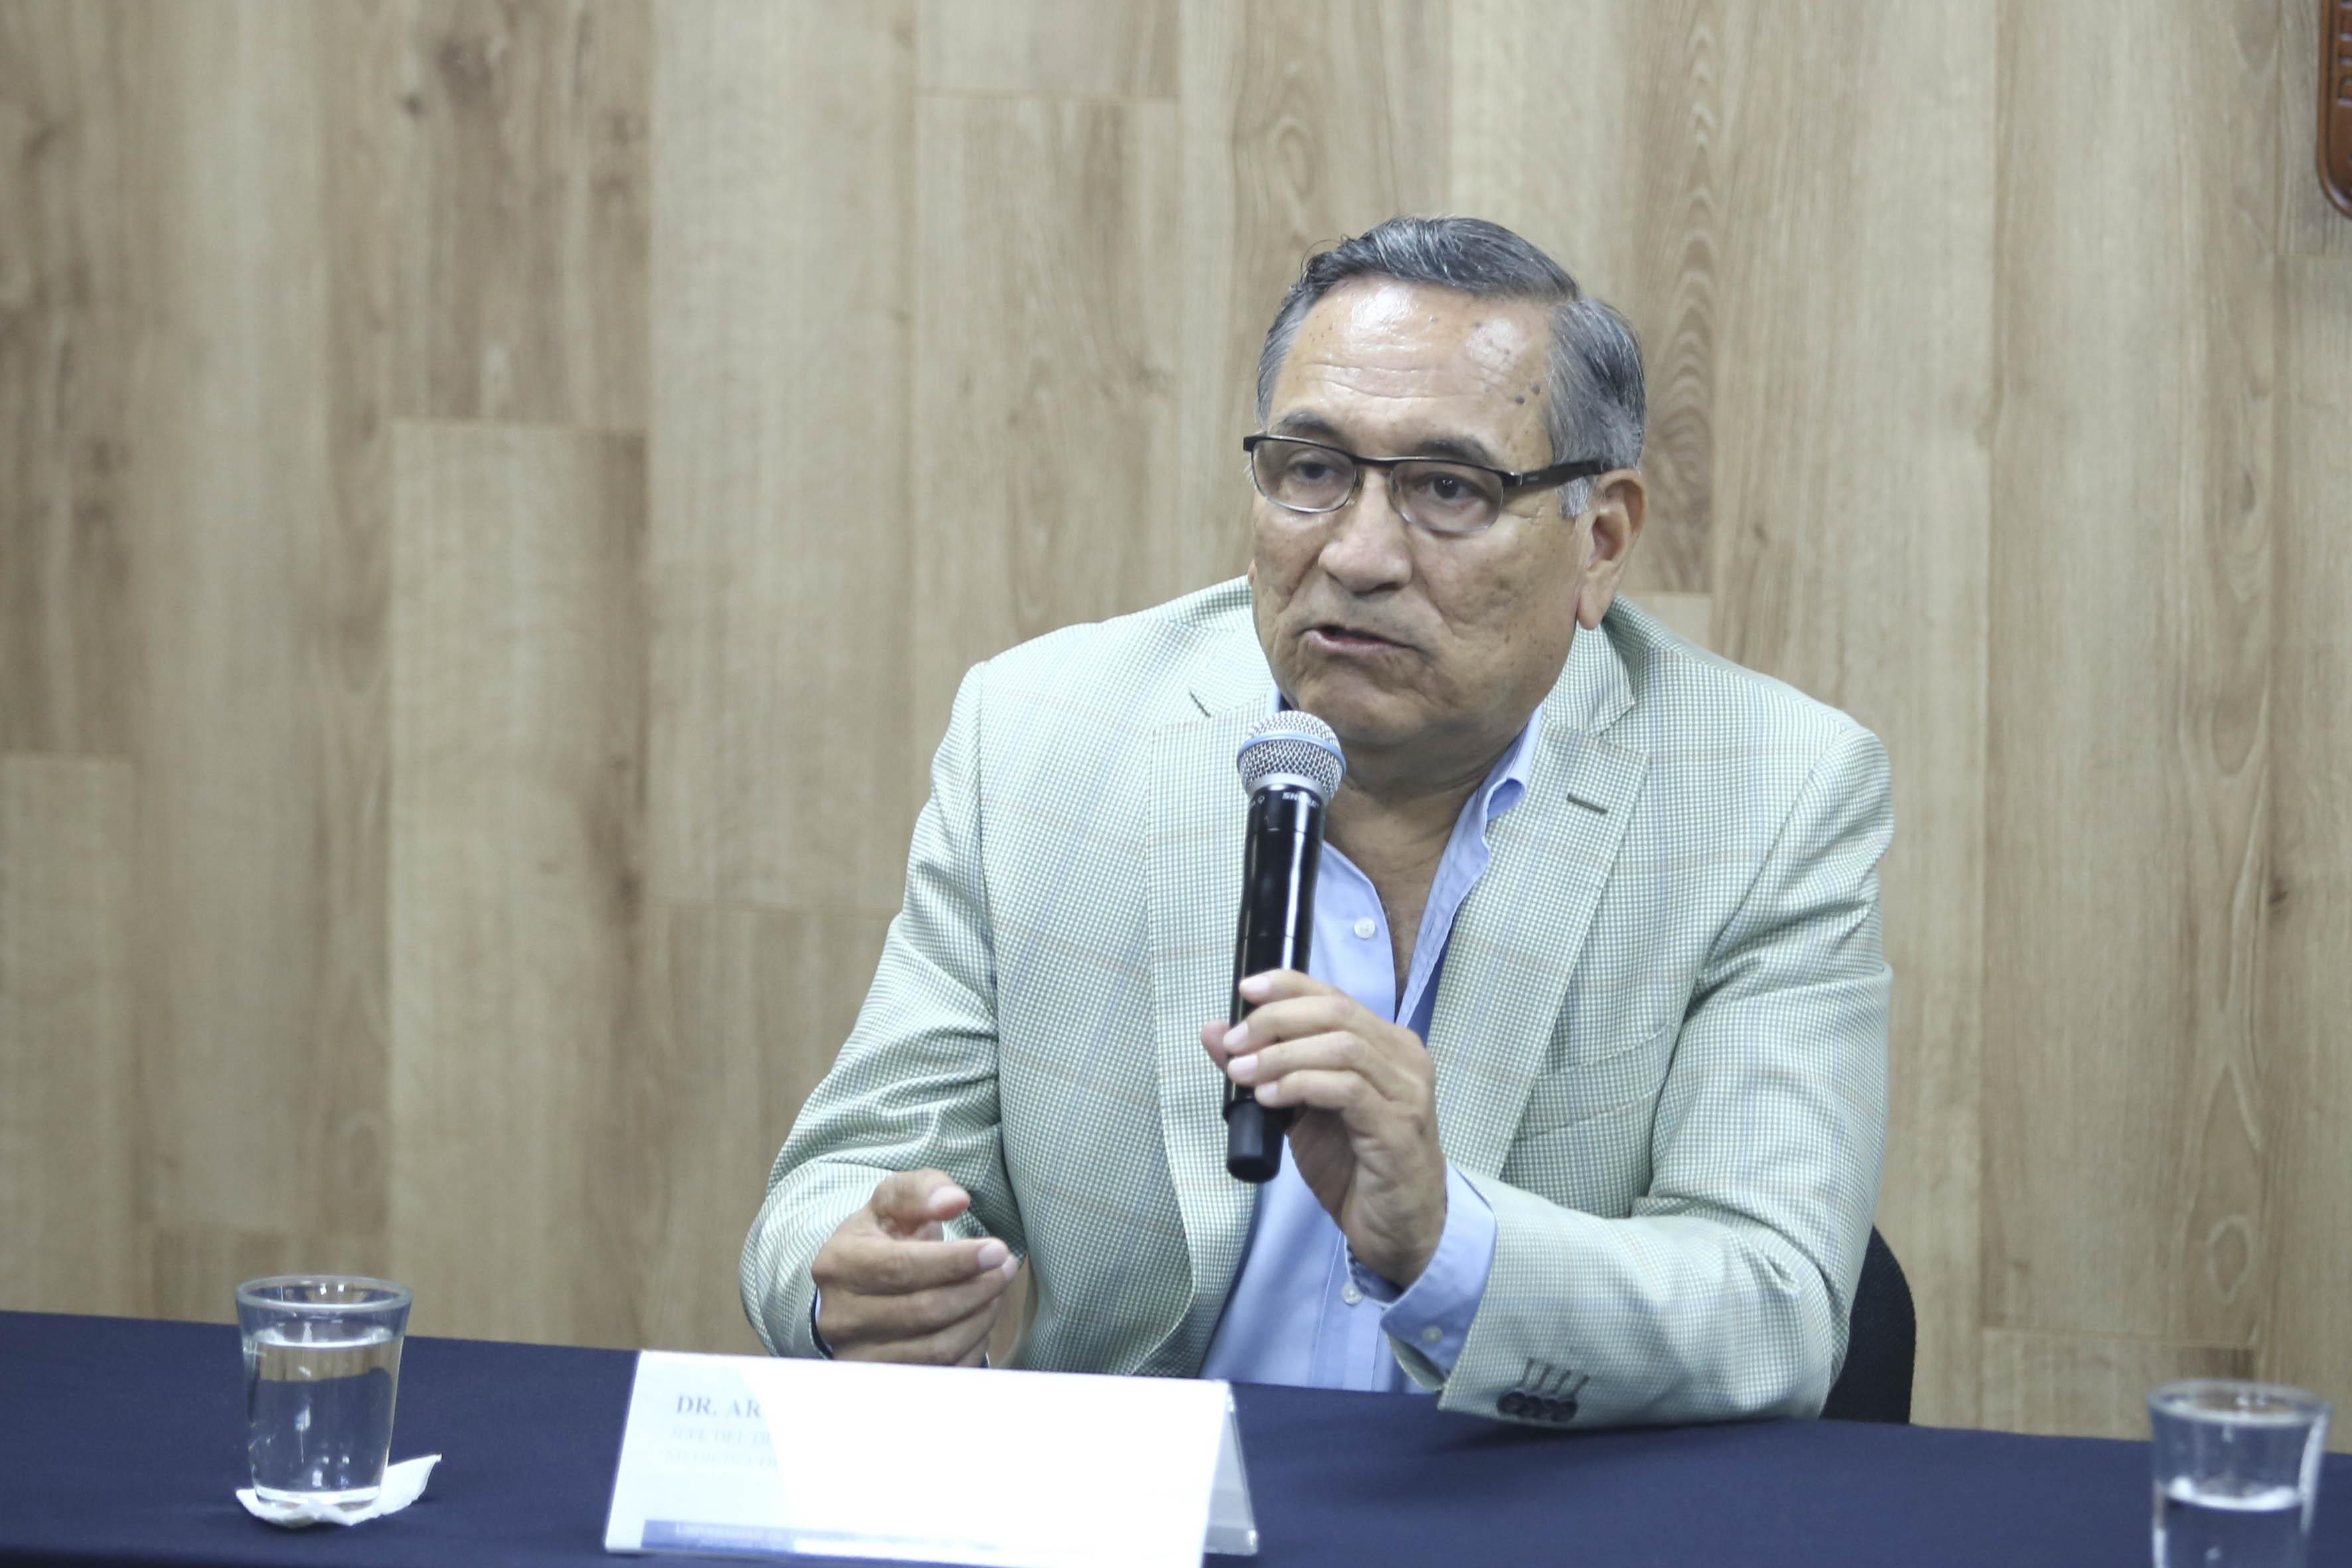 Dr. Arturo Panduro Cerda, disertando en la rueda de prensa